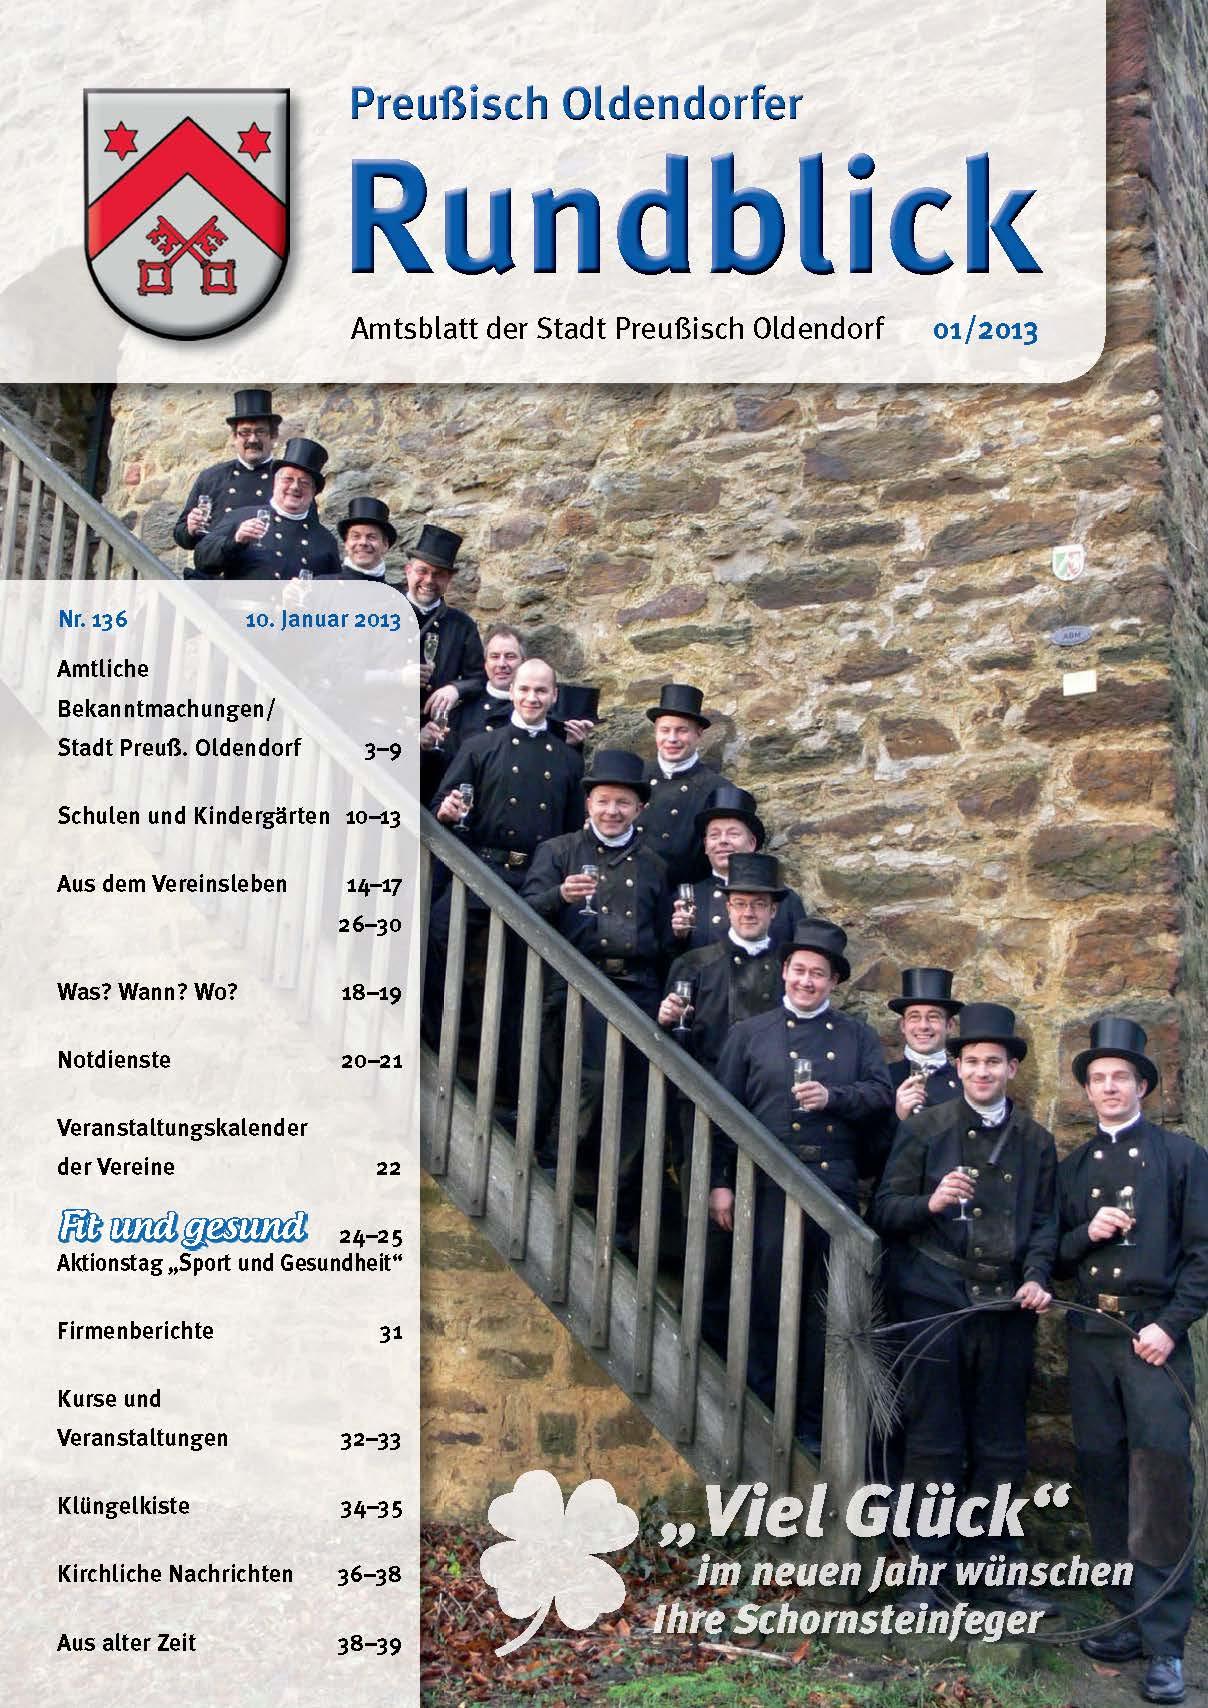 Rundblick 1-2013 Titel